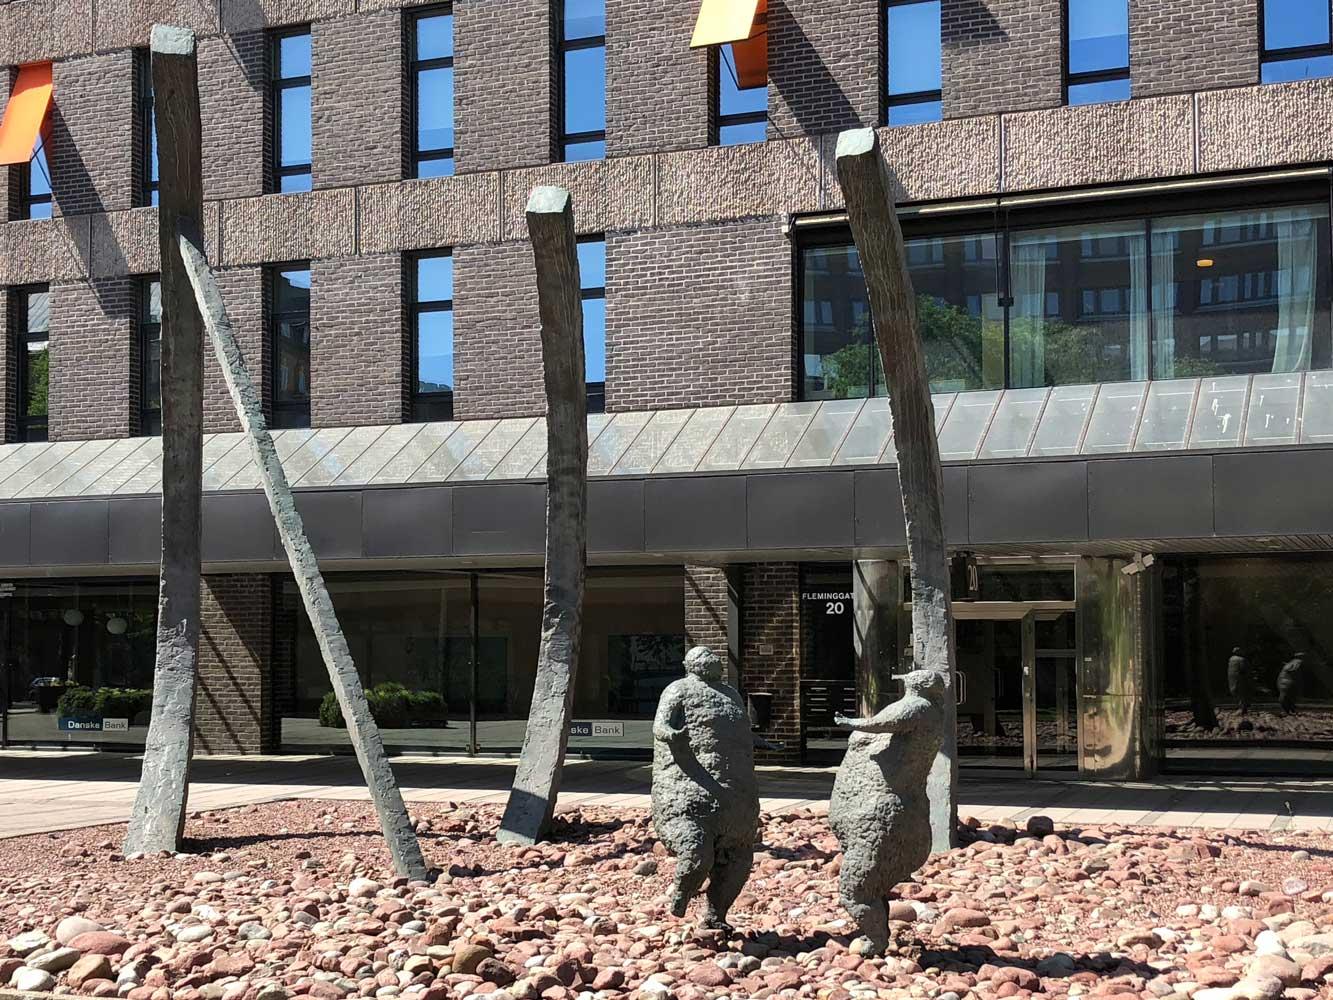 Noas dans, Lasse Trollberg, Flemminggatan, Kungsholmen